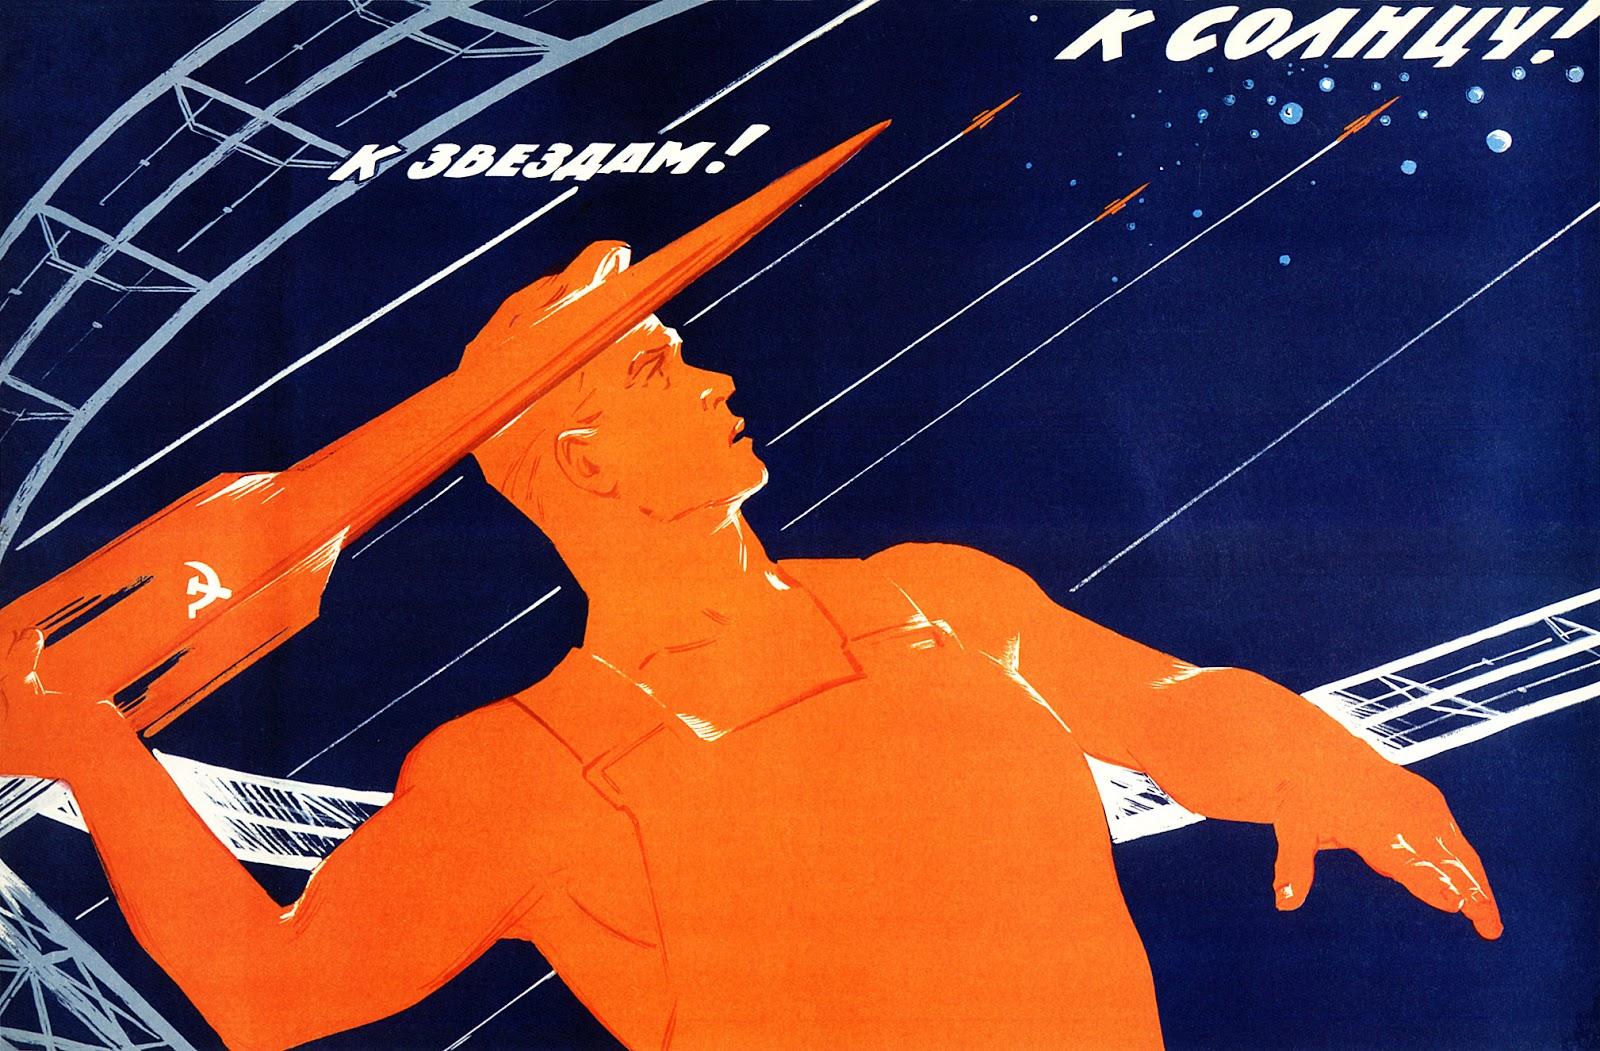 soviet space program name - photo #16